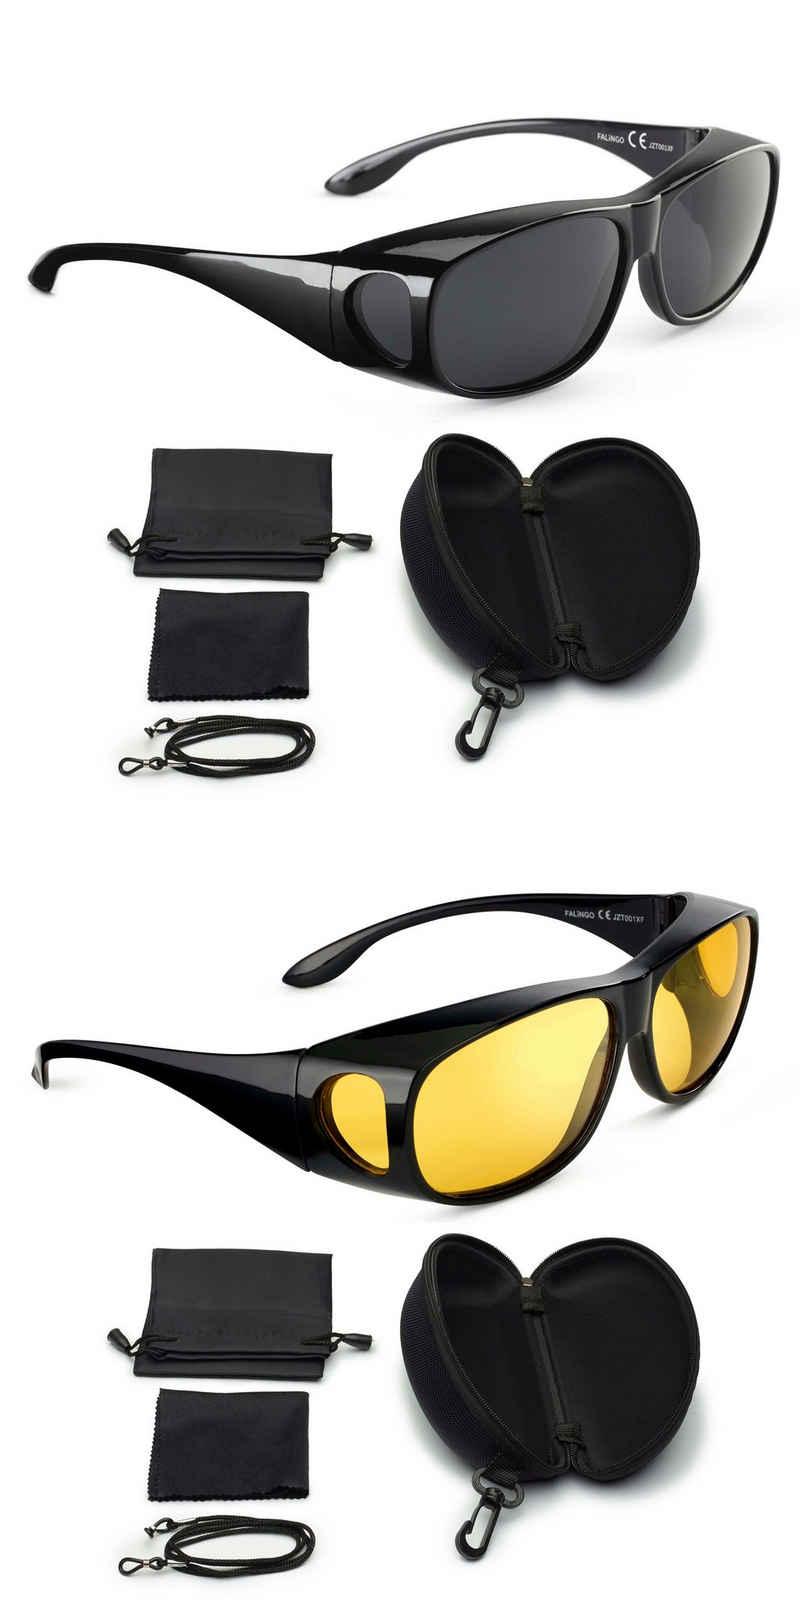 FALINGO Sonnenbrille »Sonnenüberbrille Nachtsichtüberbrille Überbrille Überziehbrille DAY AND NIGHT EDITION polarisiert UV 400« (2-St)